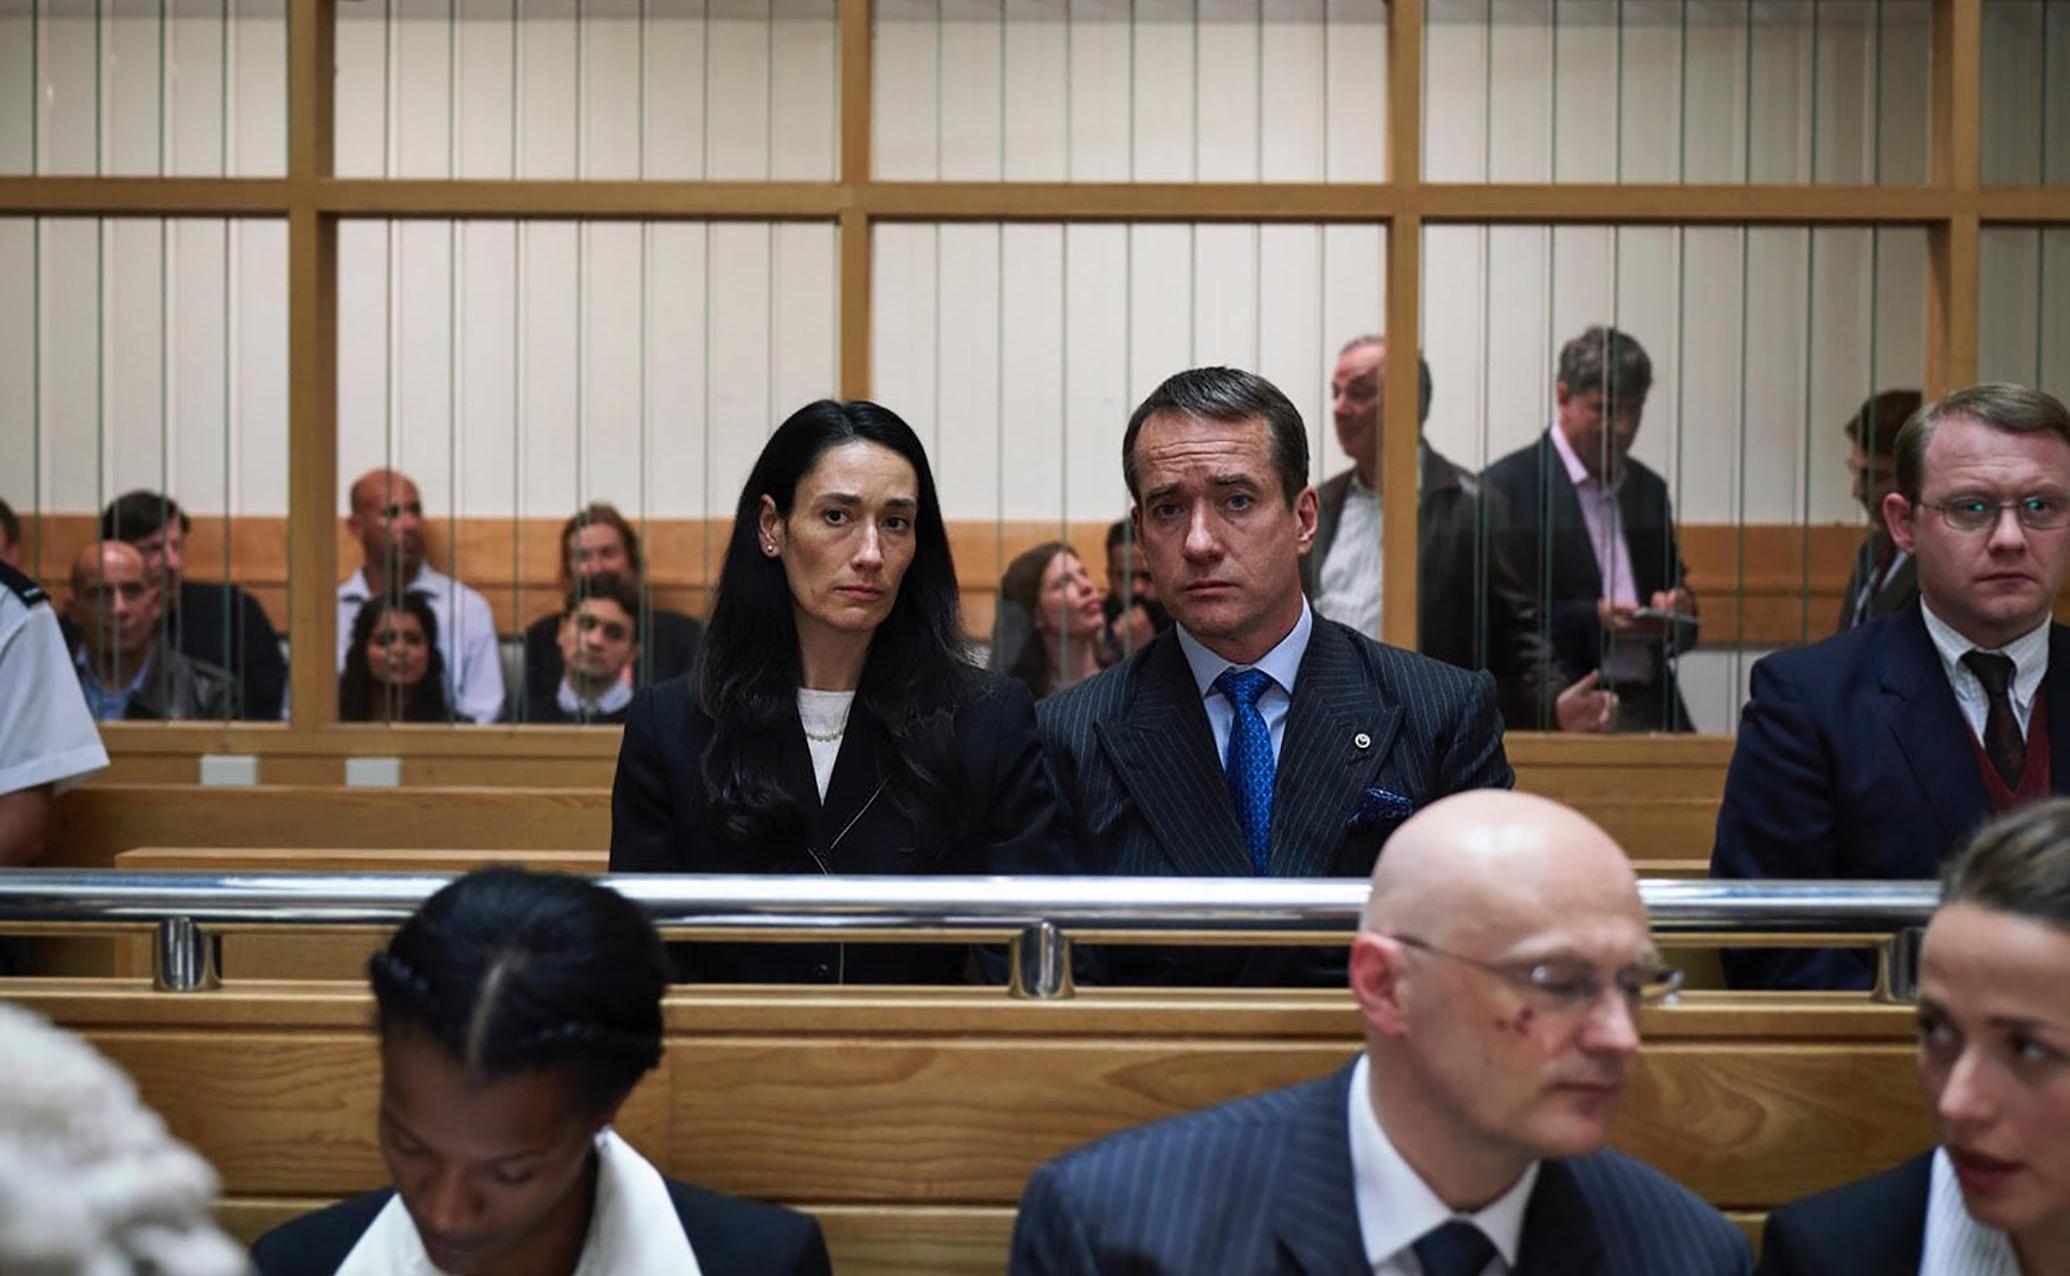 quiz matthew macfadyen sian clifford ingram courtroom tecwen whittock coughing major millionaire